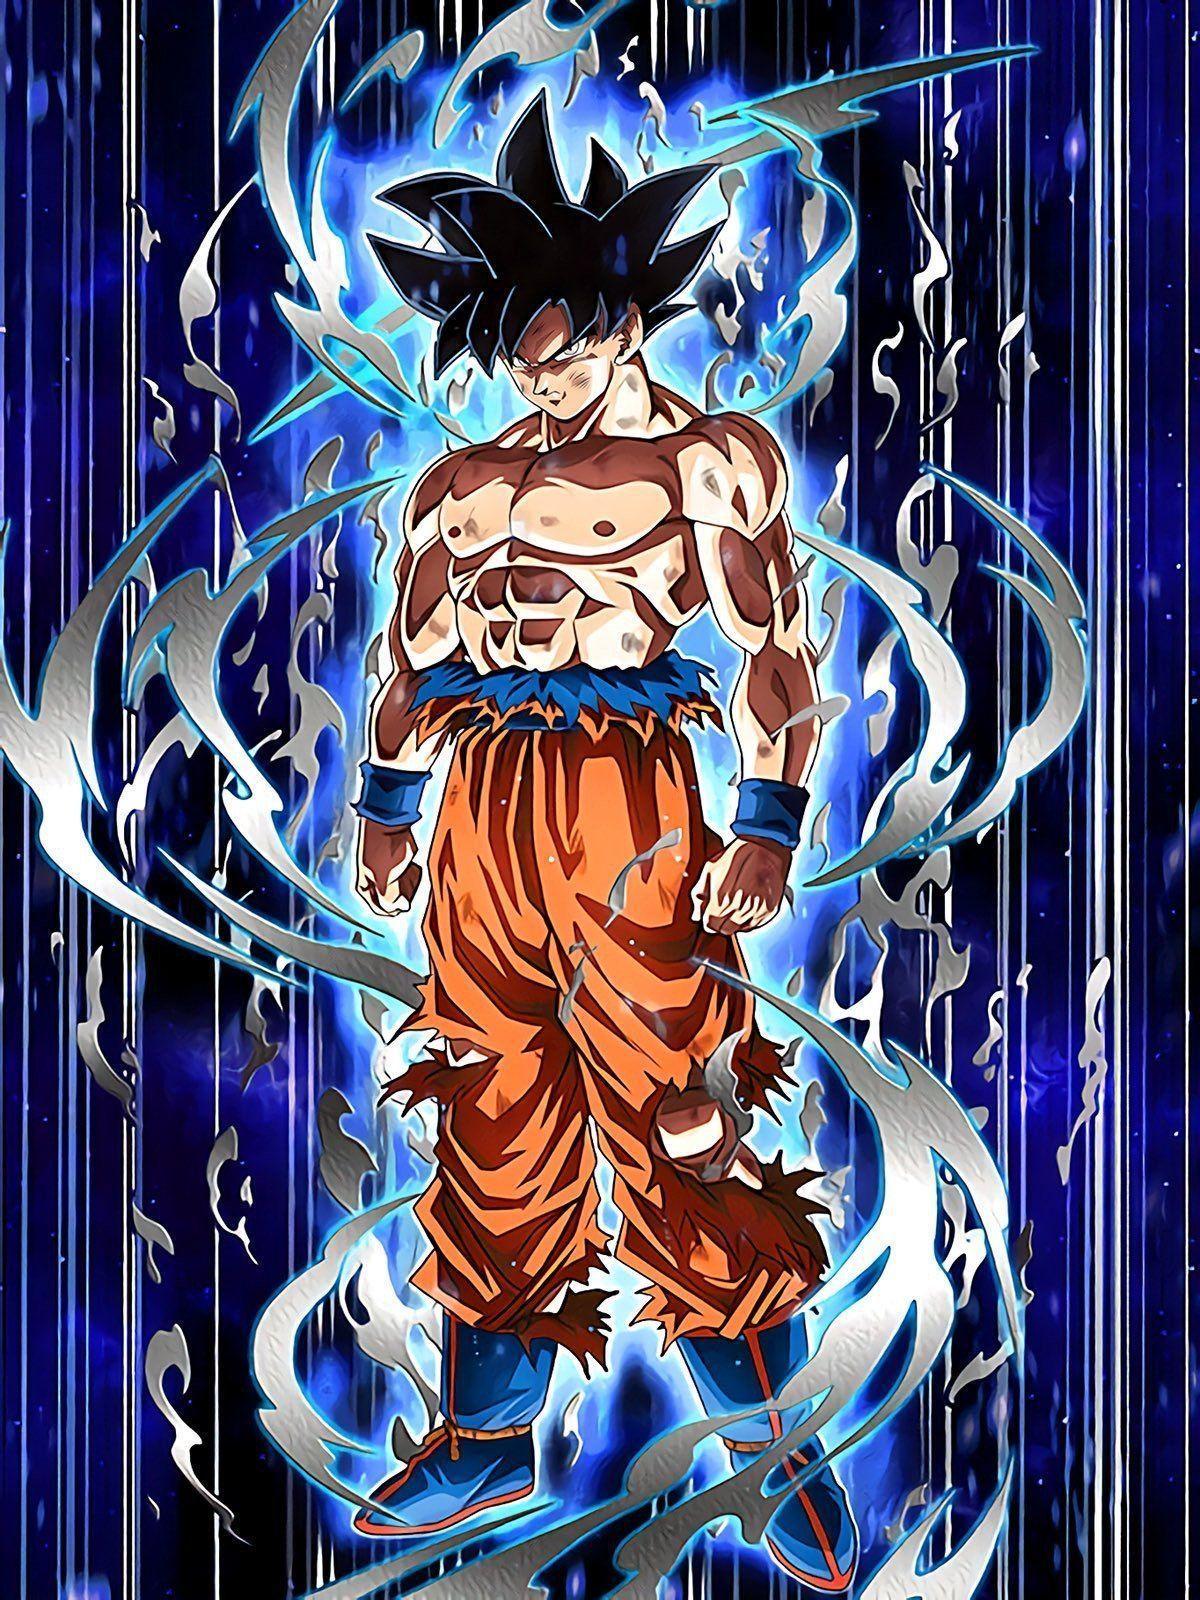 Goku master ultra instinct wallpapers wallpaper cave - Goku ultra instinct mastered wallpaper ...